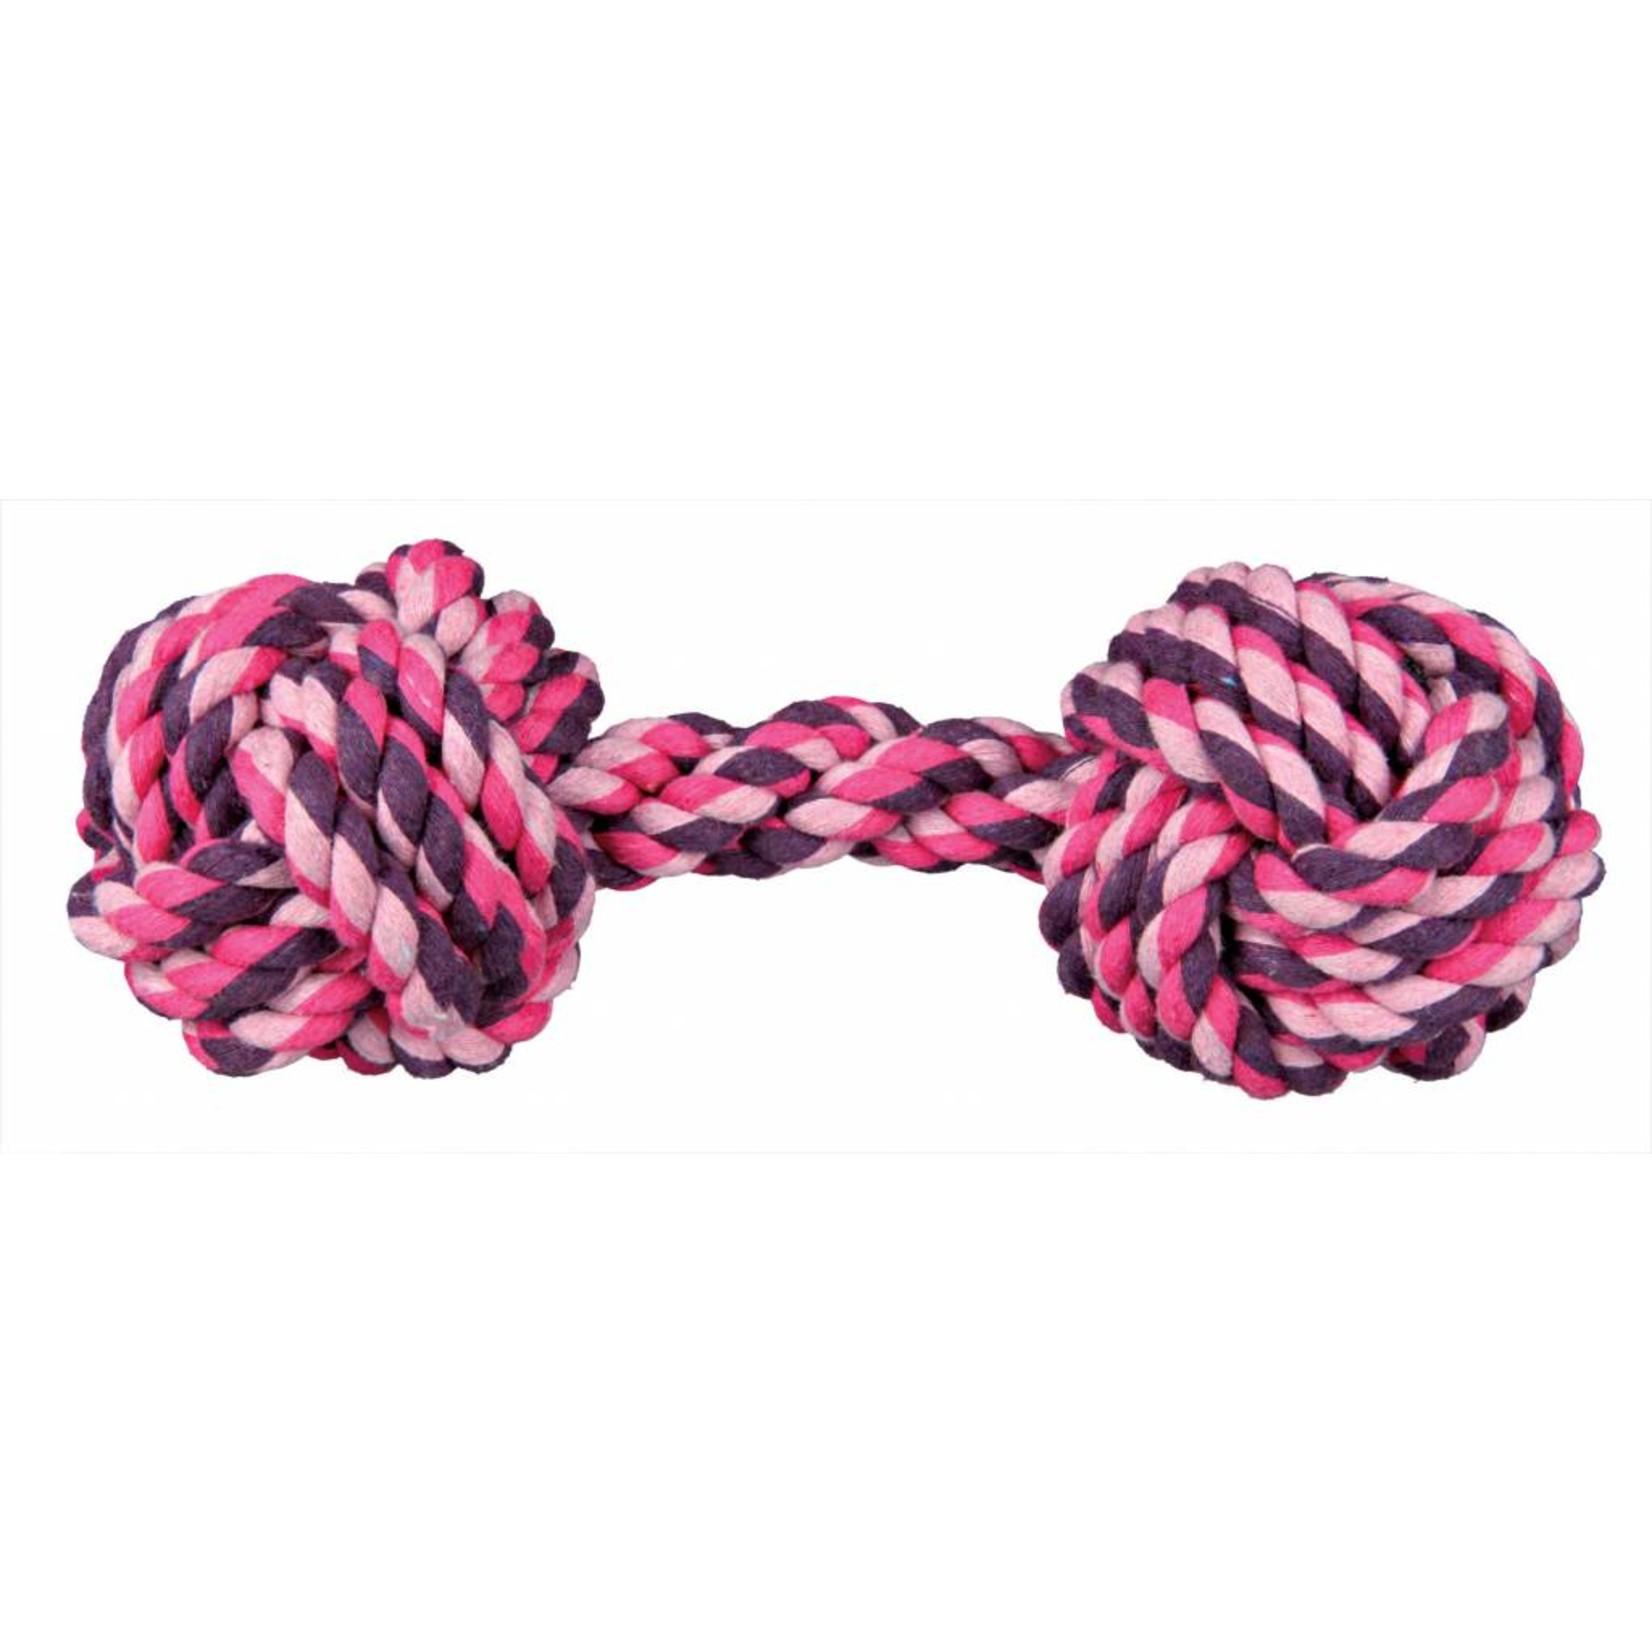 Trixie Denta Fun Rope Dumbbell Dog Toy